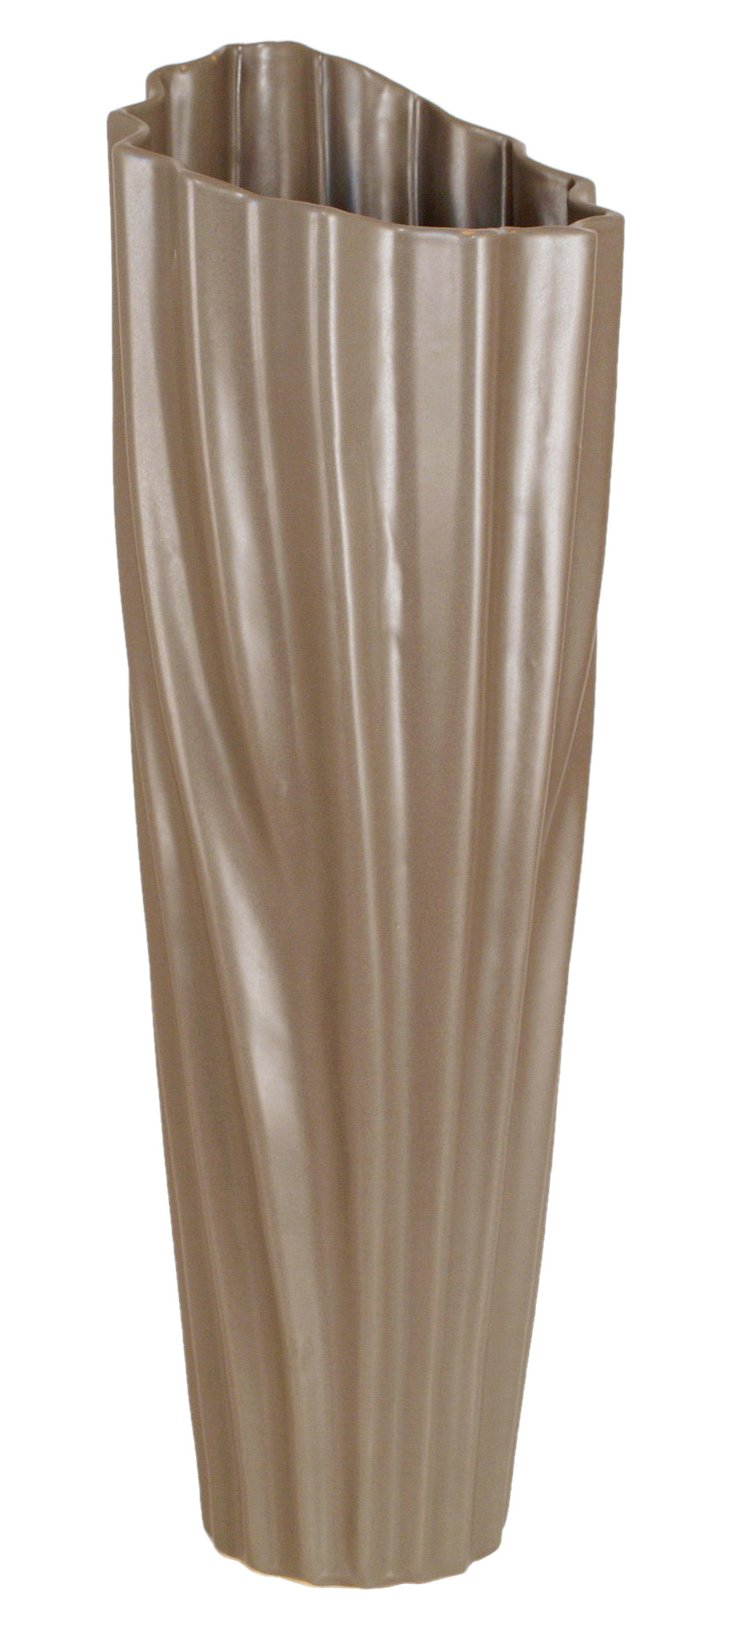 "22"" Rippled Ceramic Vase"